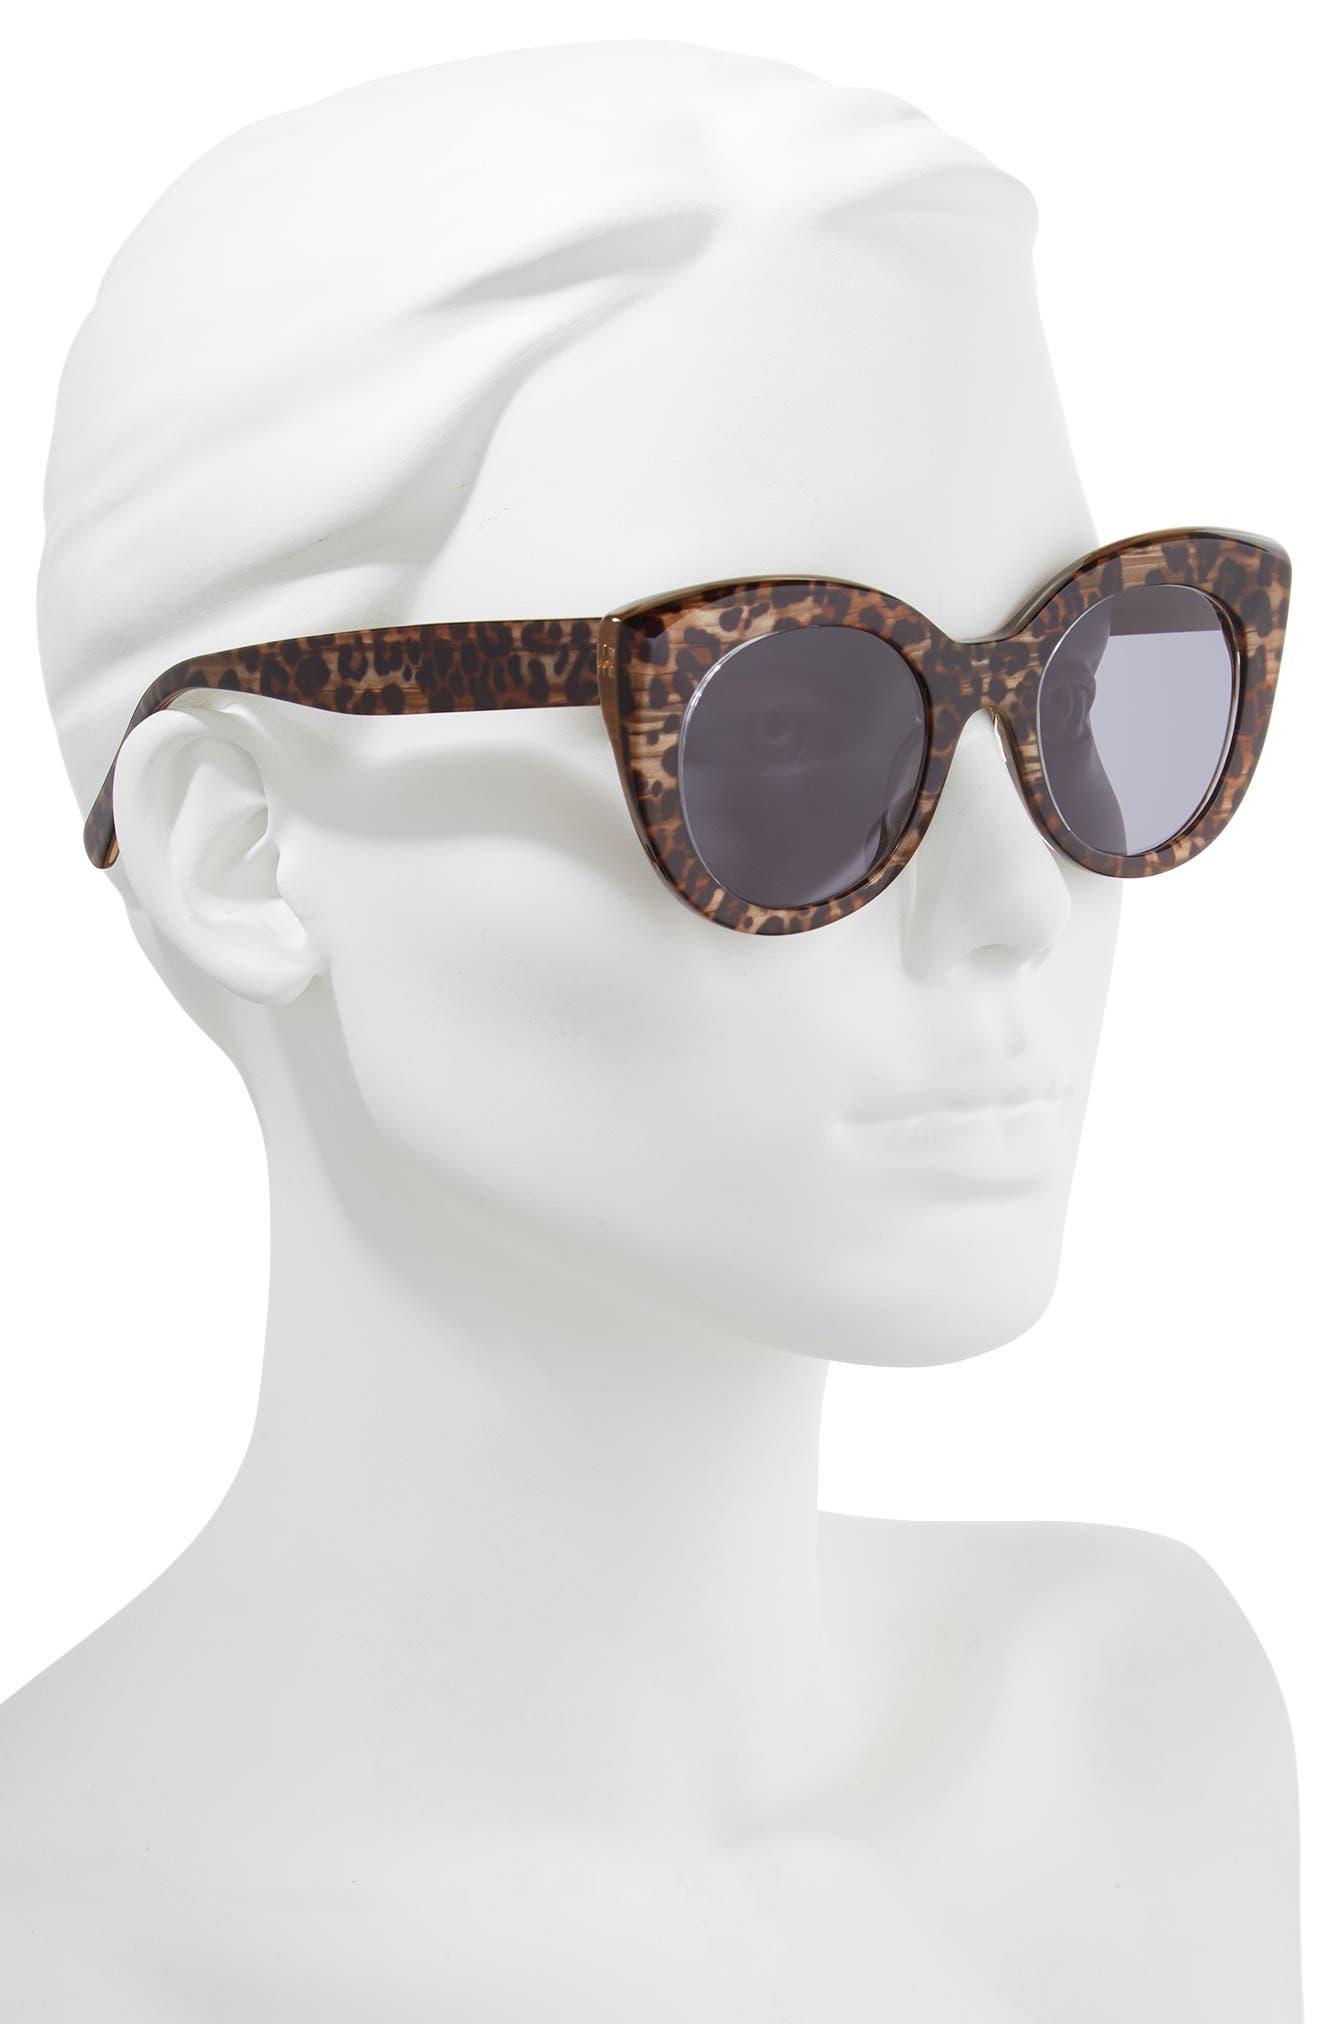 D'BLANC x Amuse Society Modern Lover 51mm Cat Eye Sunglasses,                             Alternate thumbnail 2, color,                             Cheetah/ Grey